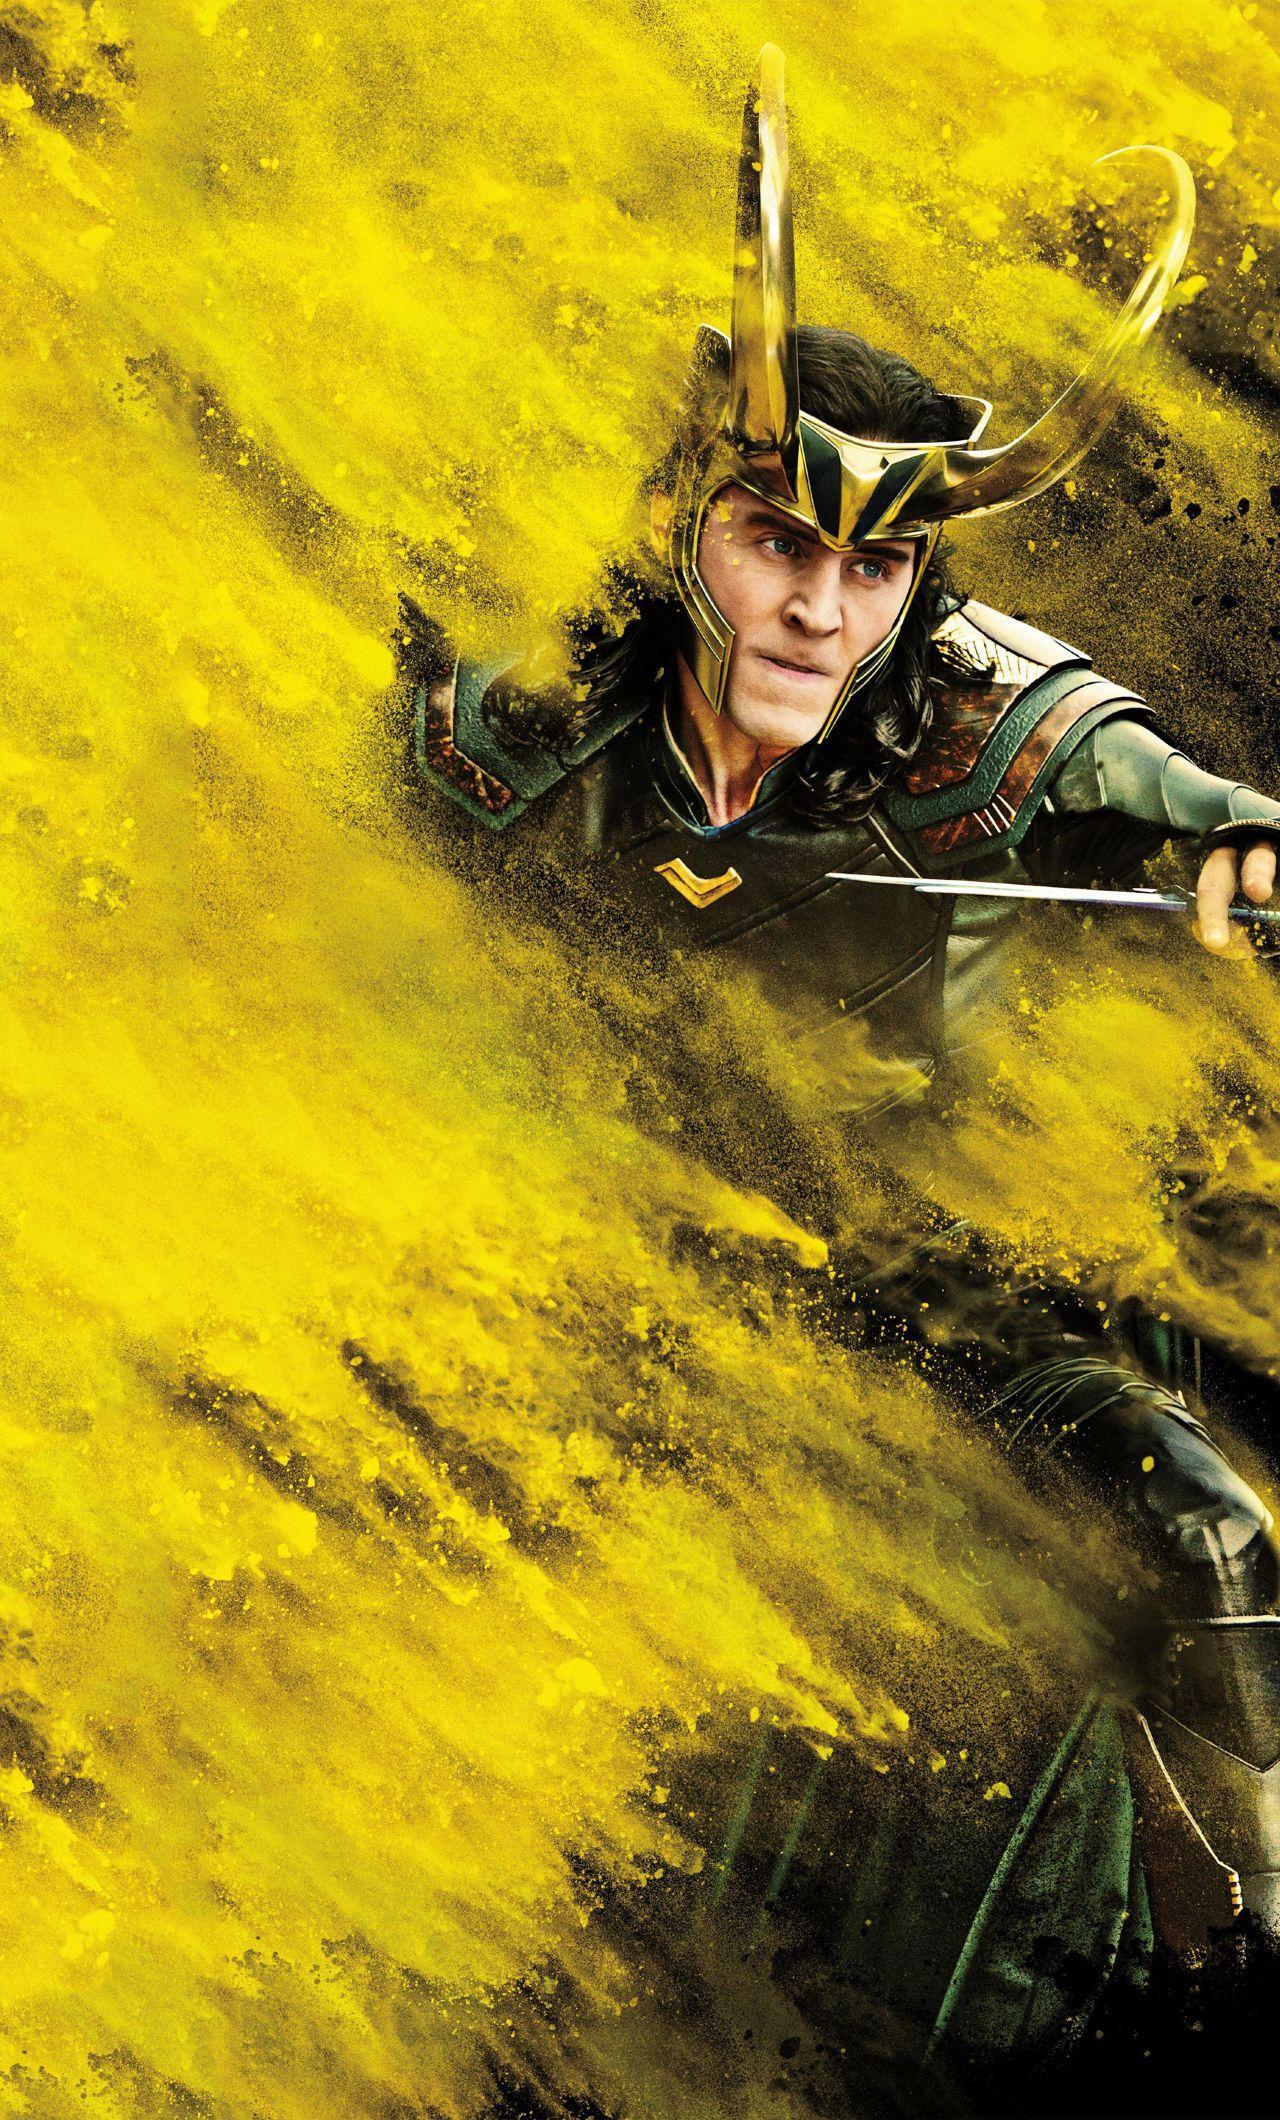 Loki wallpapers top free loki backgrounds wallpaperaccess - Free thor wallpaper ...